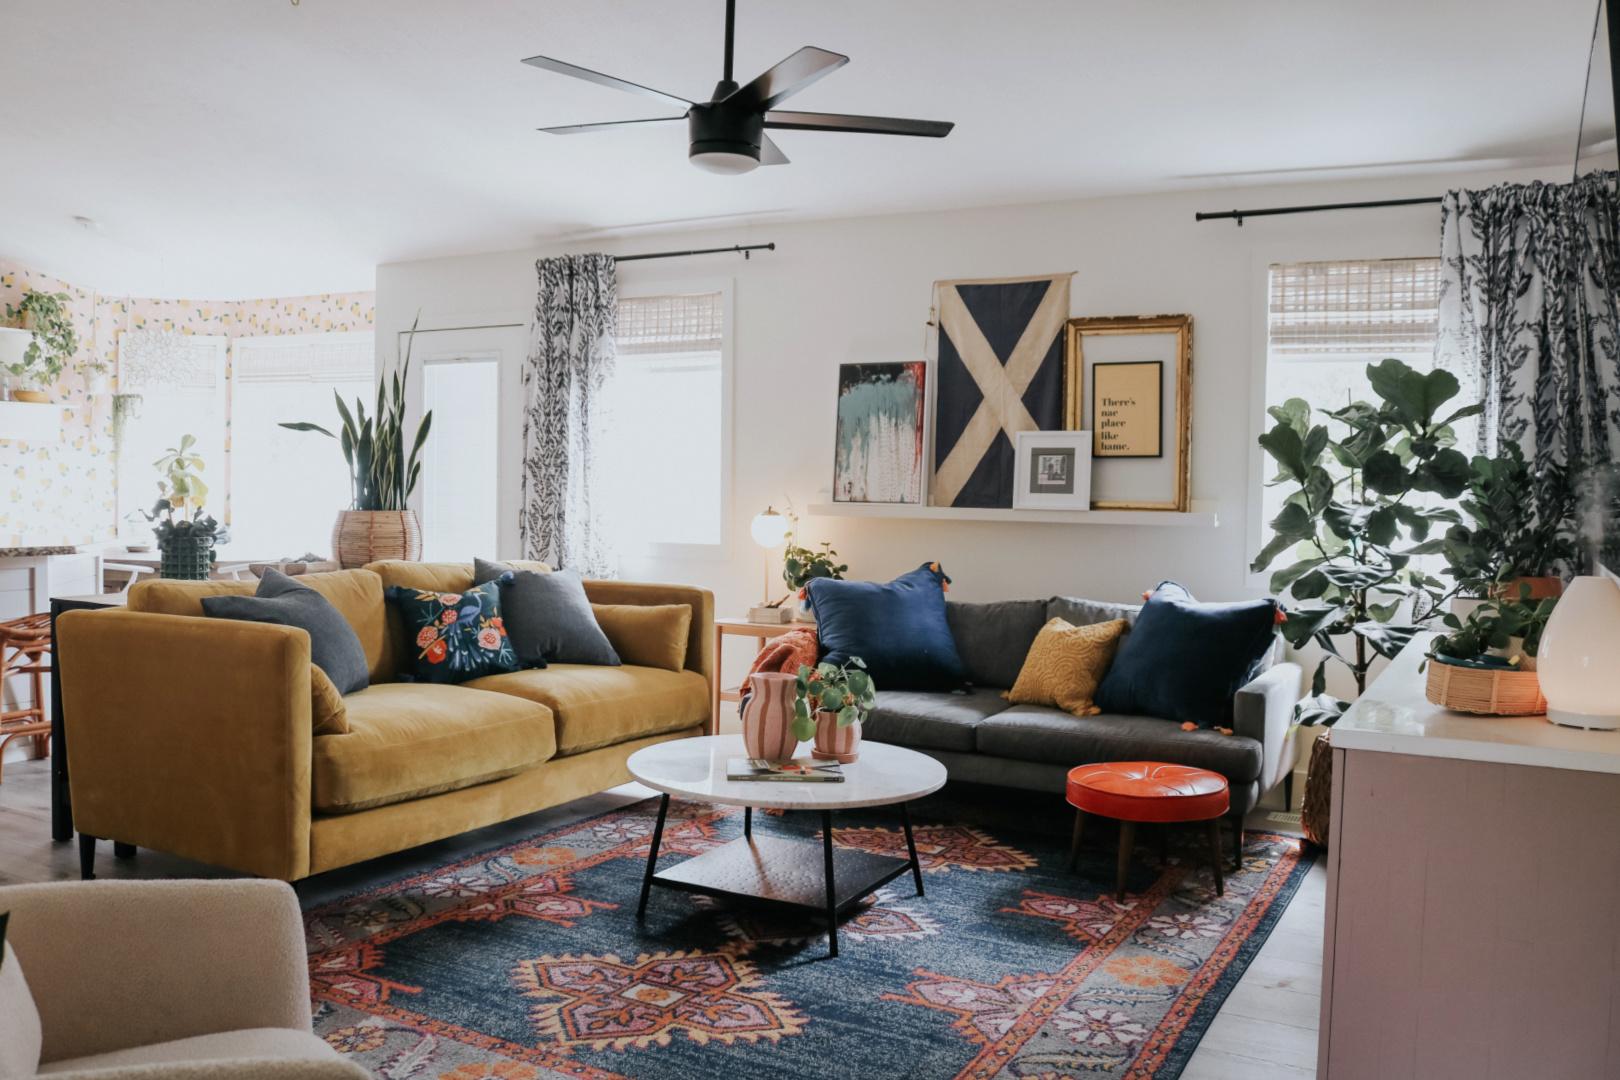 Colorful Fun Family Room- Vintage Inspired Velvet Sofa Picture ledge  Colorful family room Photo ledge Gold sofa Houseplants